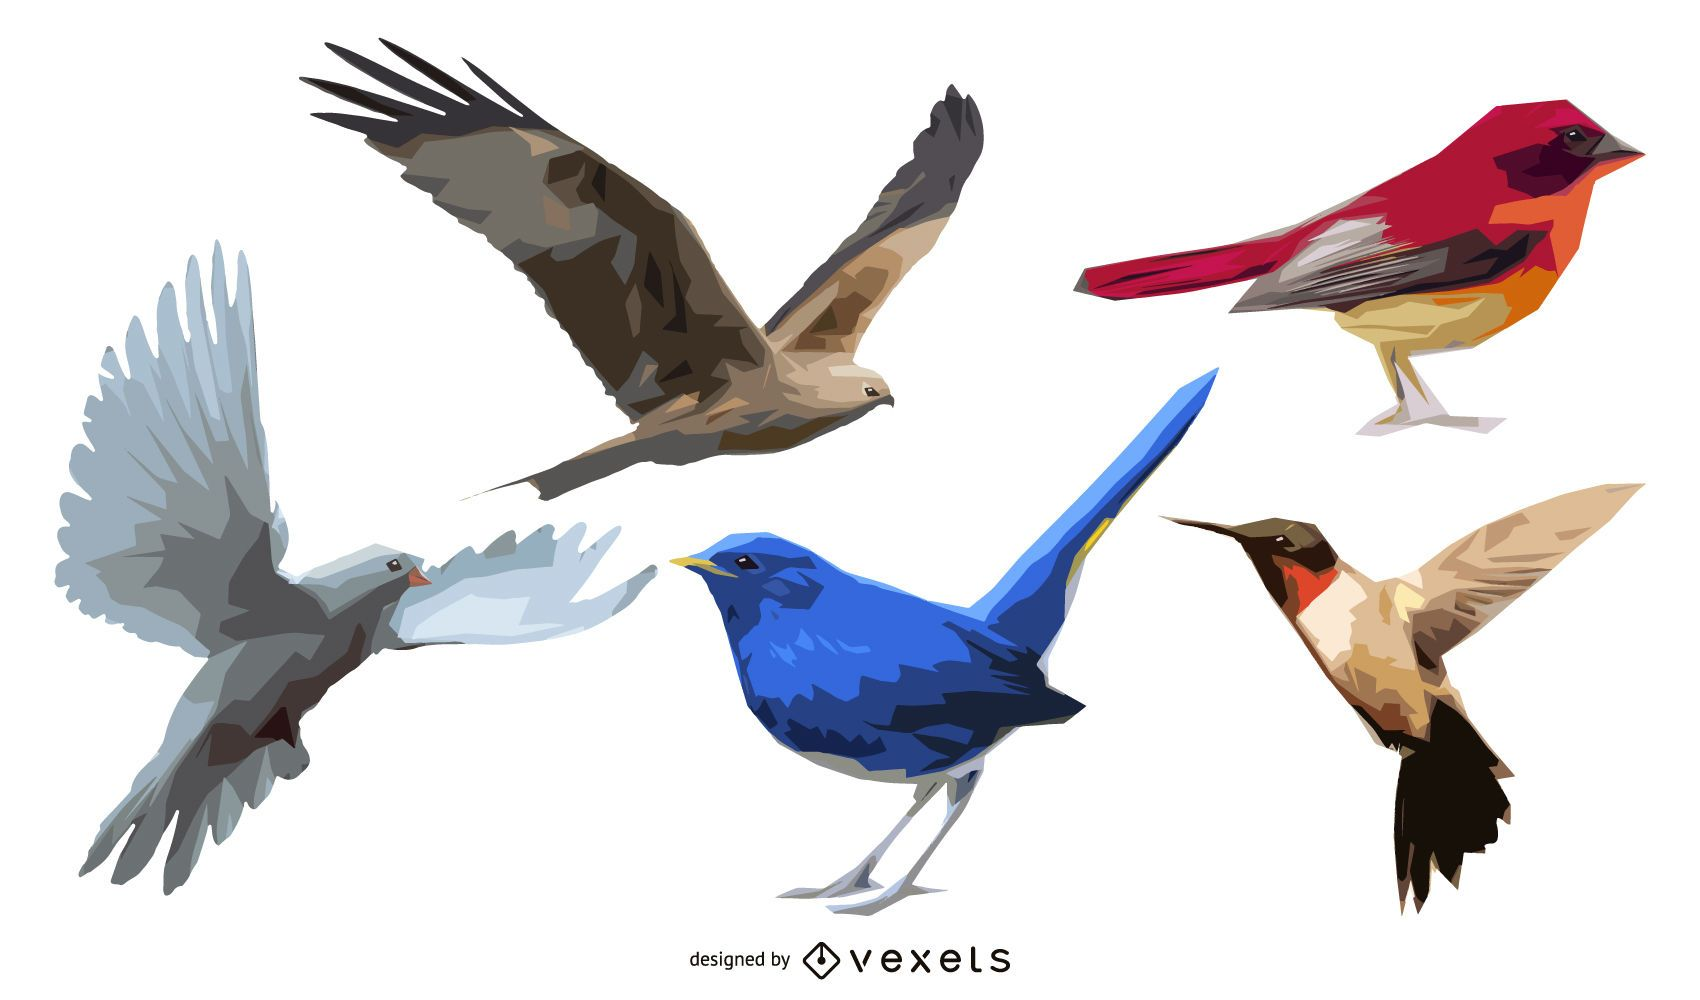 Set of 5 illustrated birds